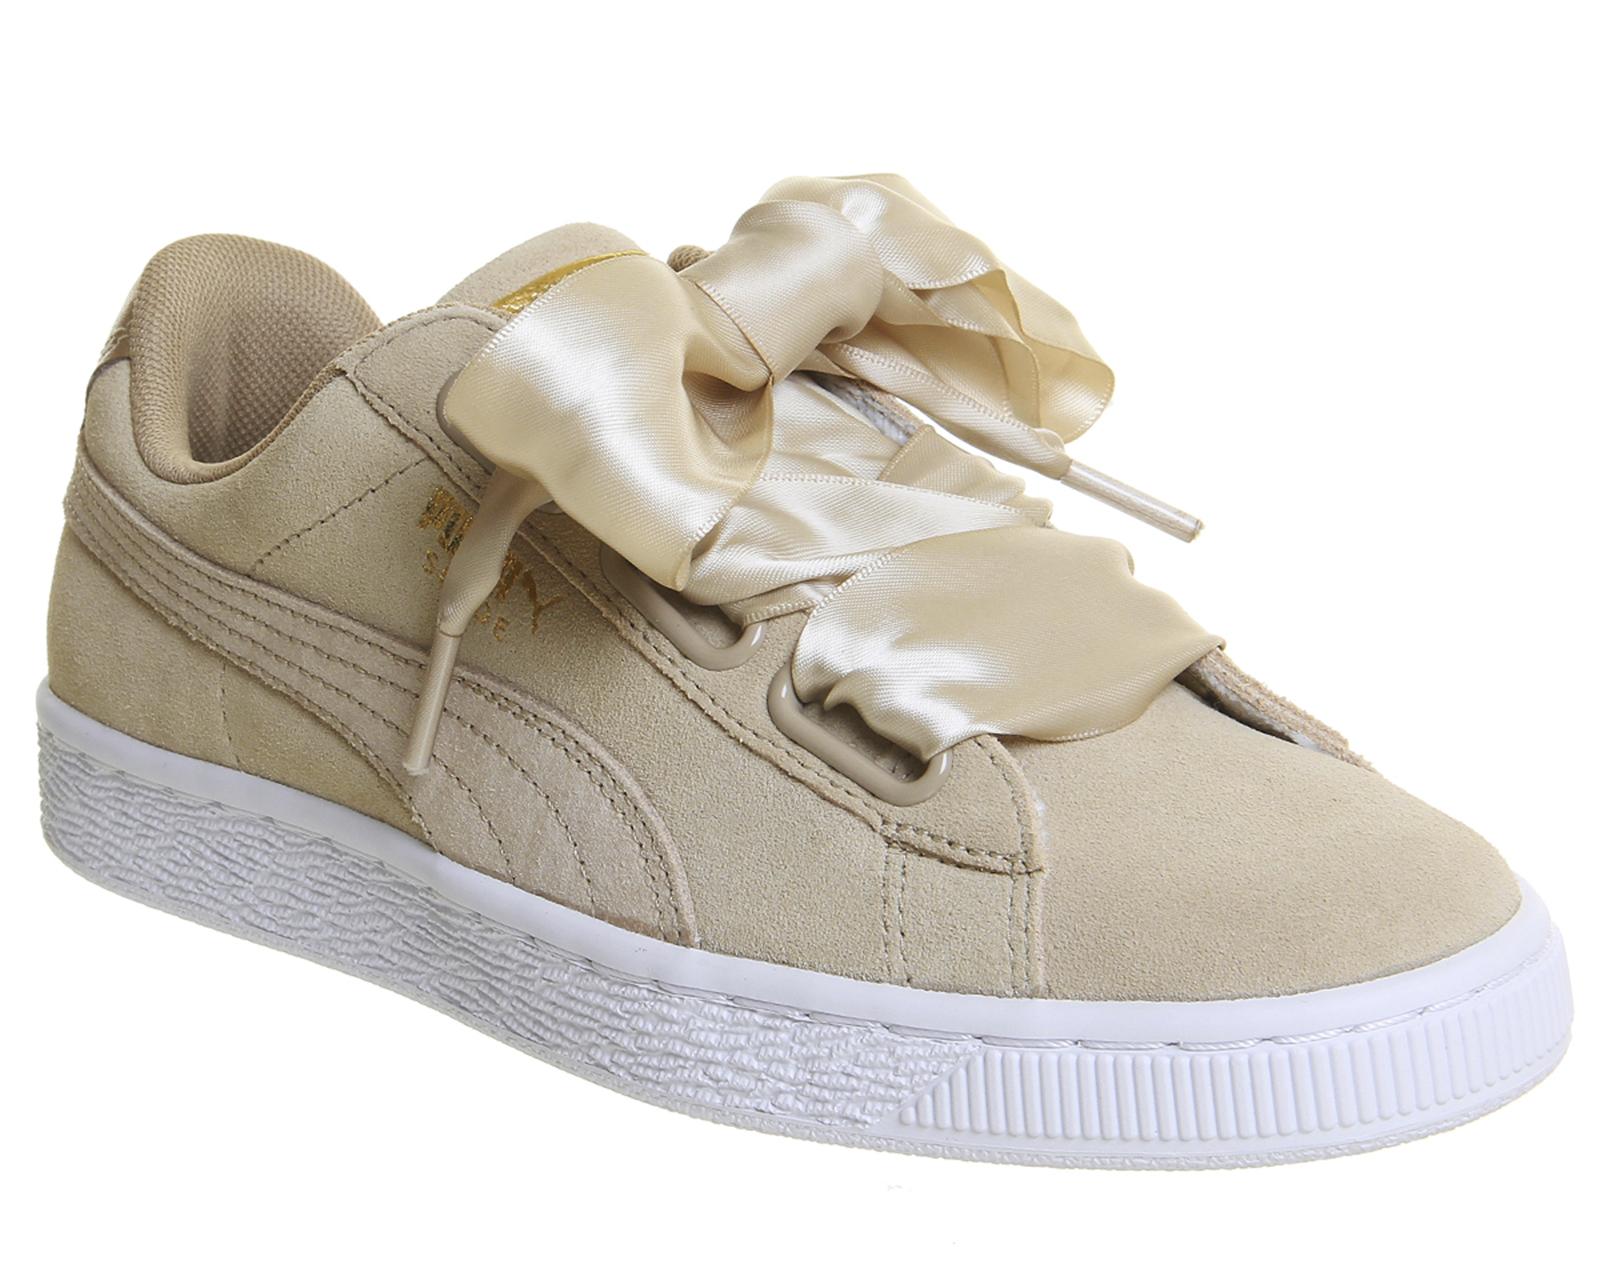 Sentinel Womens Puma Suede Heart Safari Metallic Safari Trainers Shoes 4f1e0147d